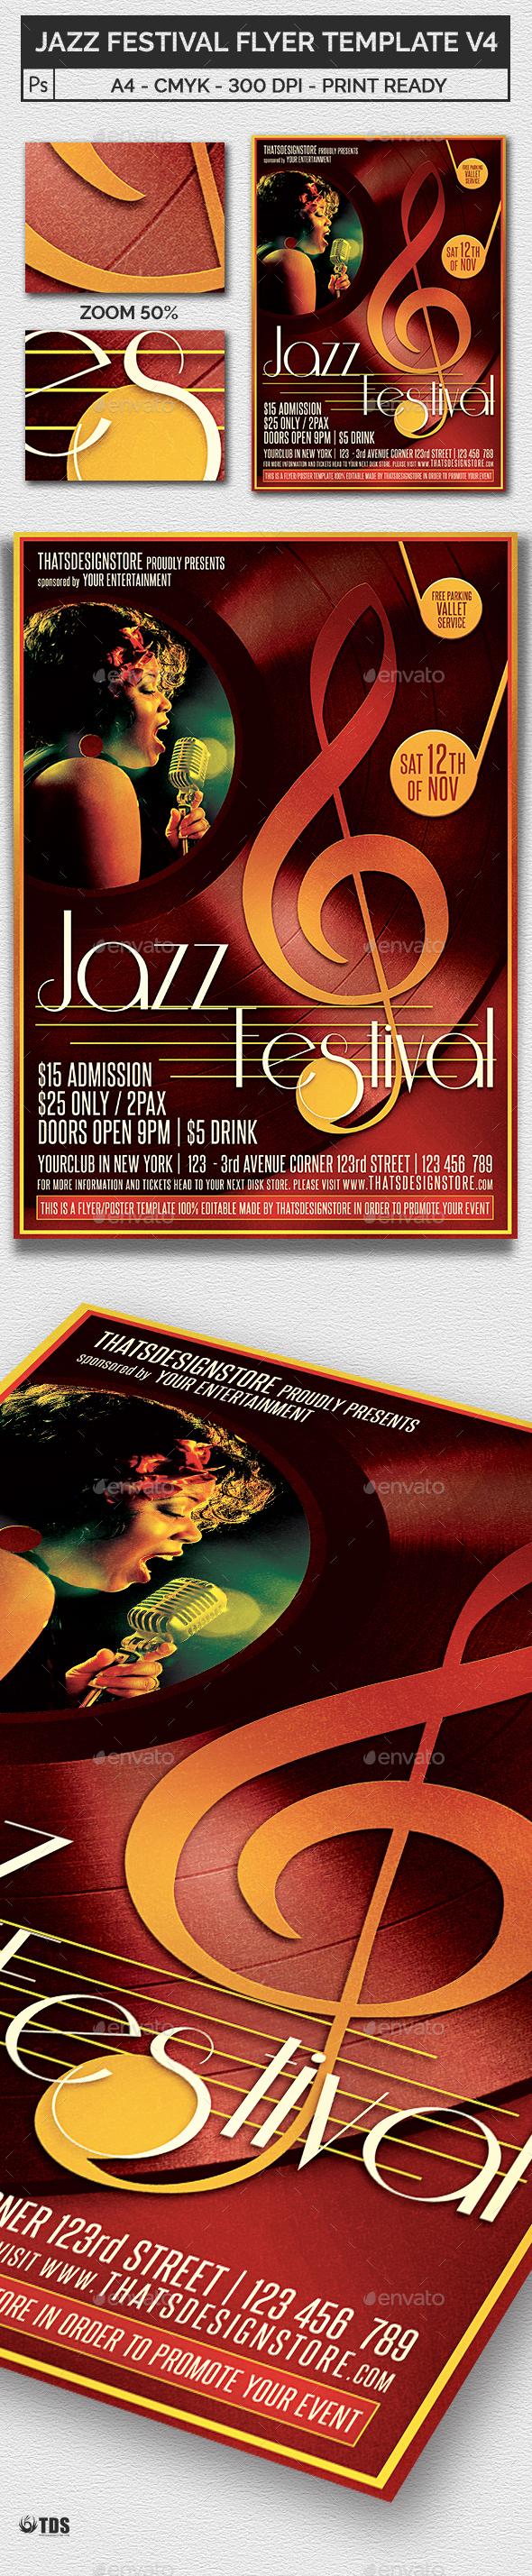 Jazz Festival Flyer Template V4 - Concerts Events